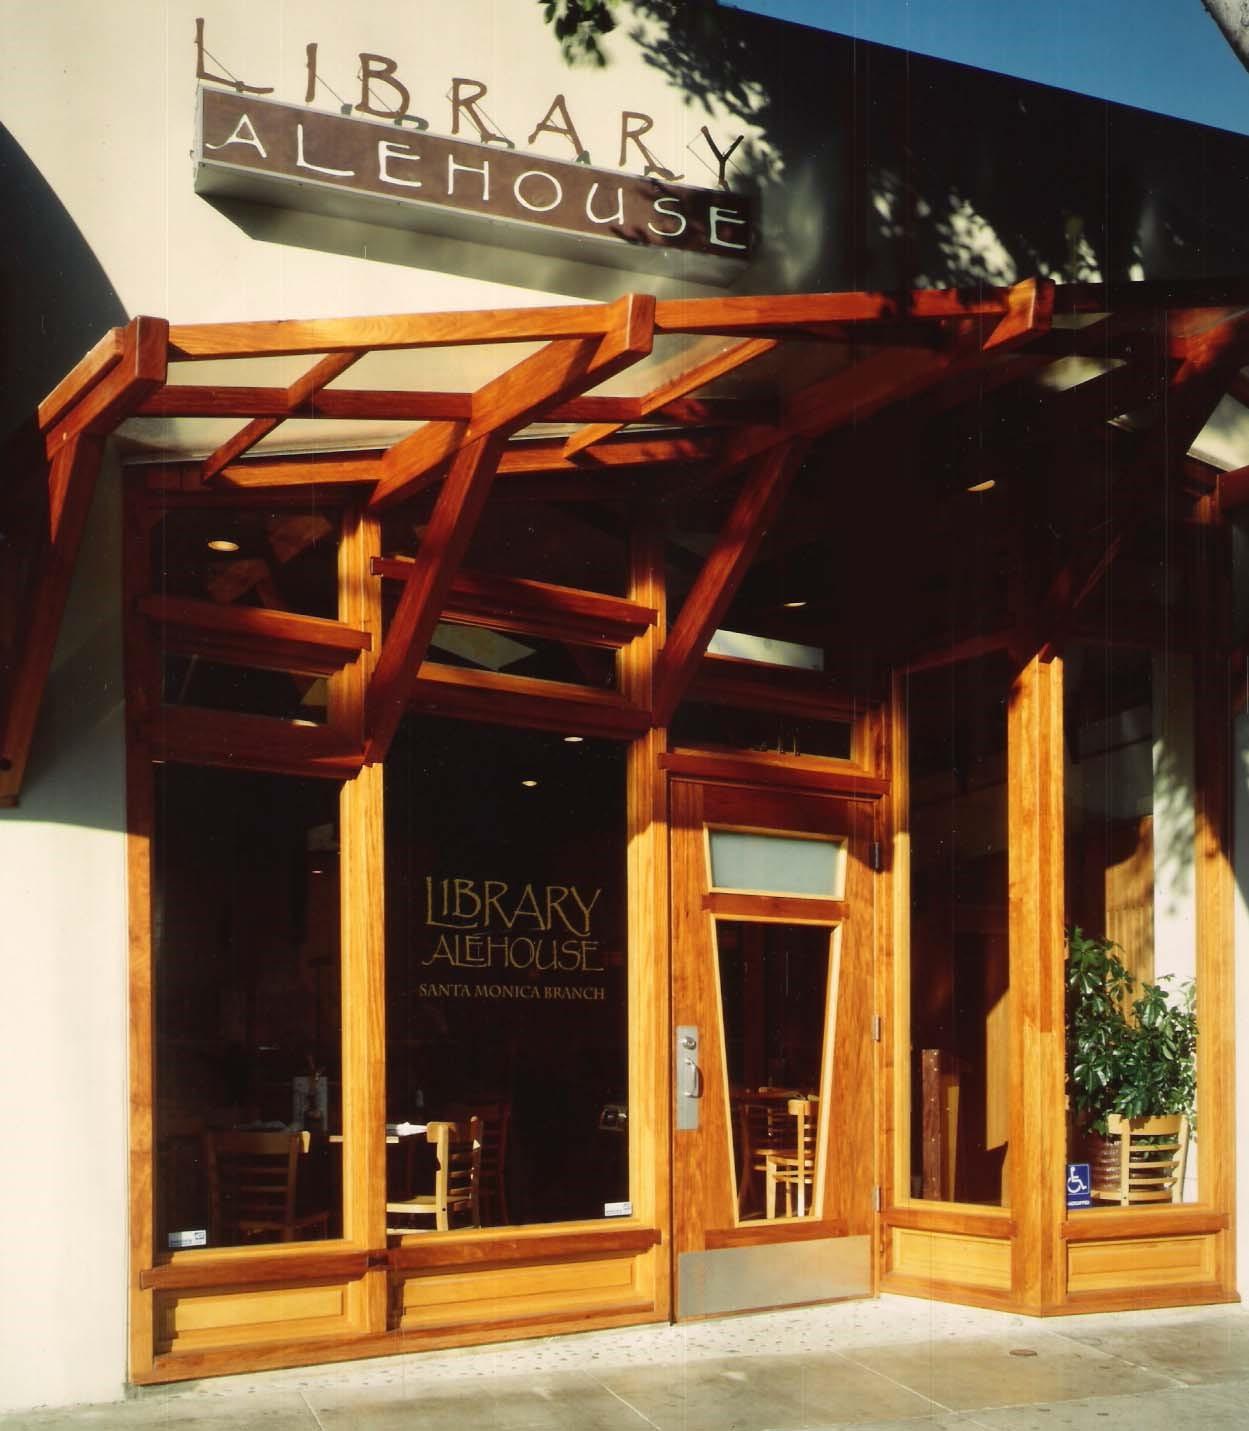 Library Alehouse, Santa Monica, California  Built using all sustainable woods including Narra, White Oak and Panga Panga.